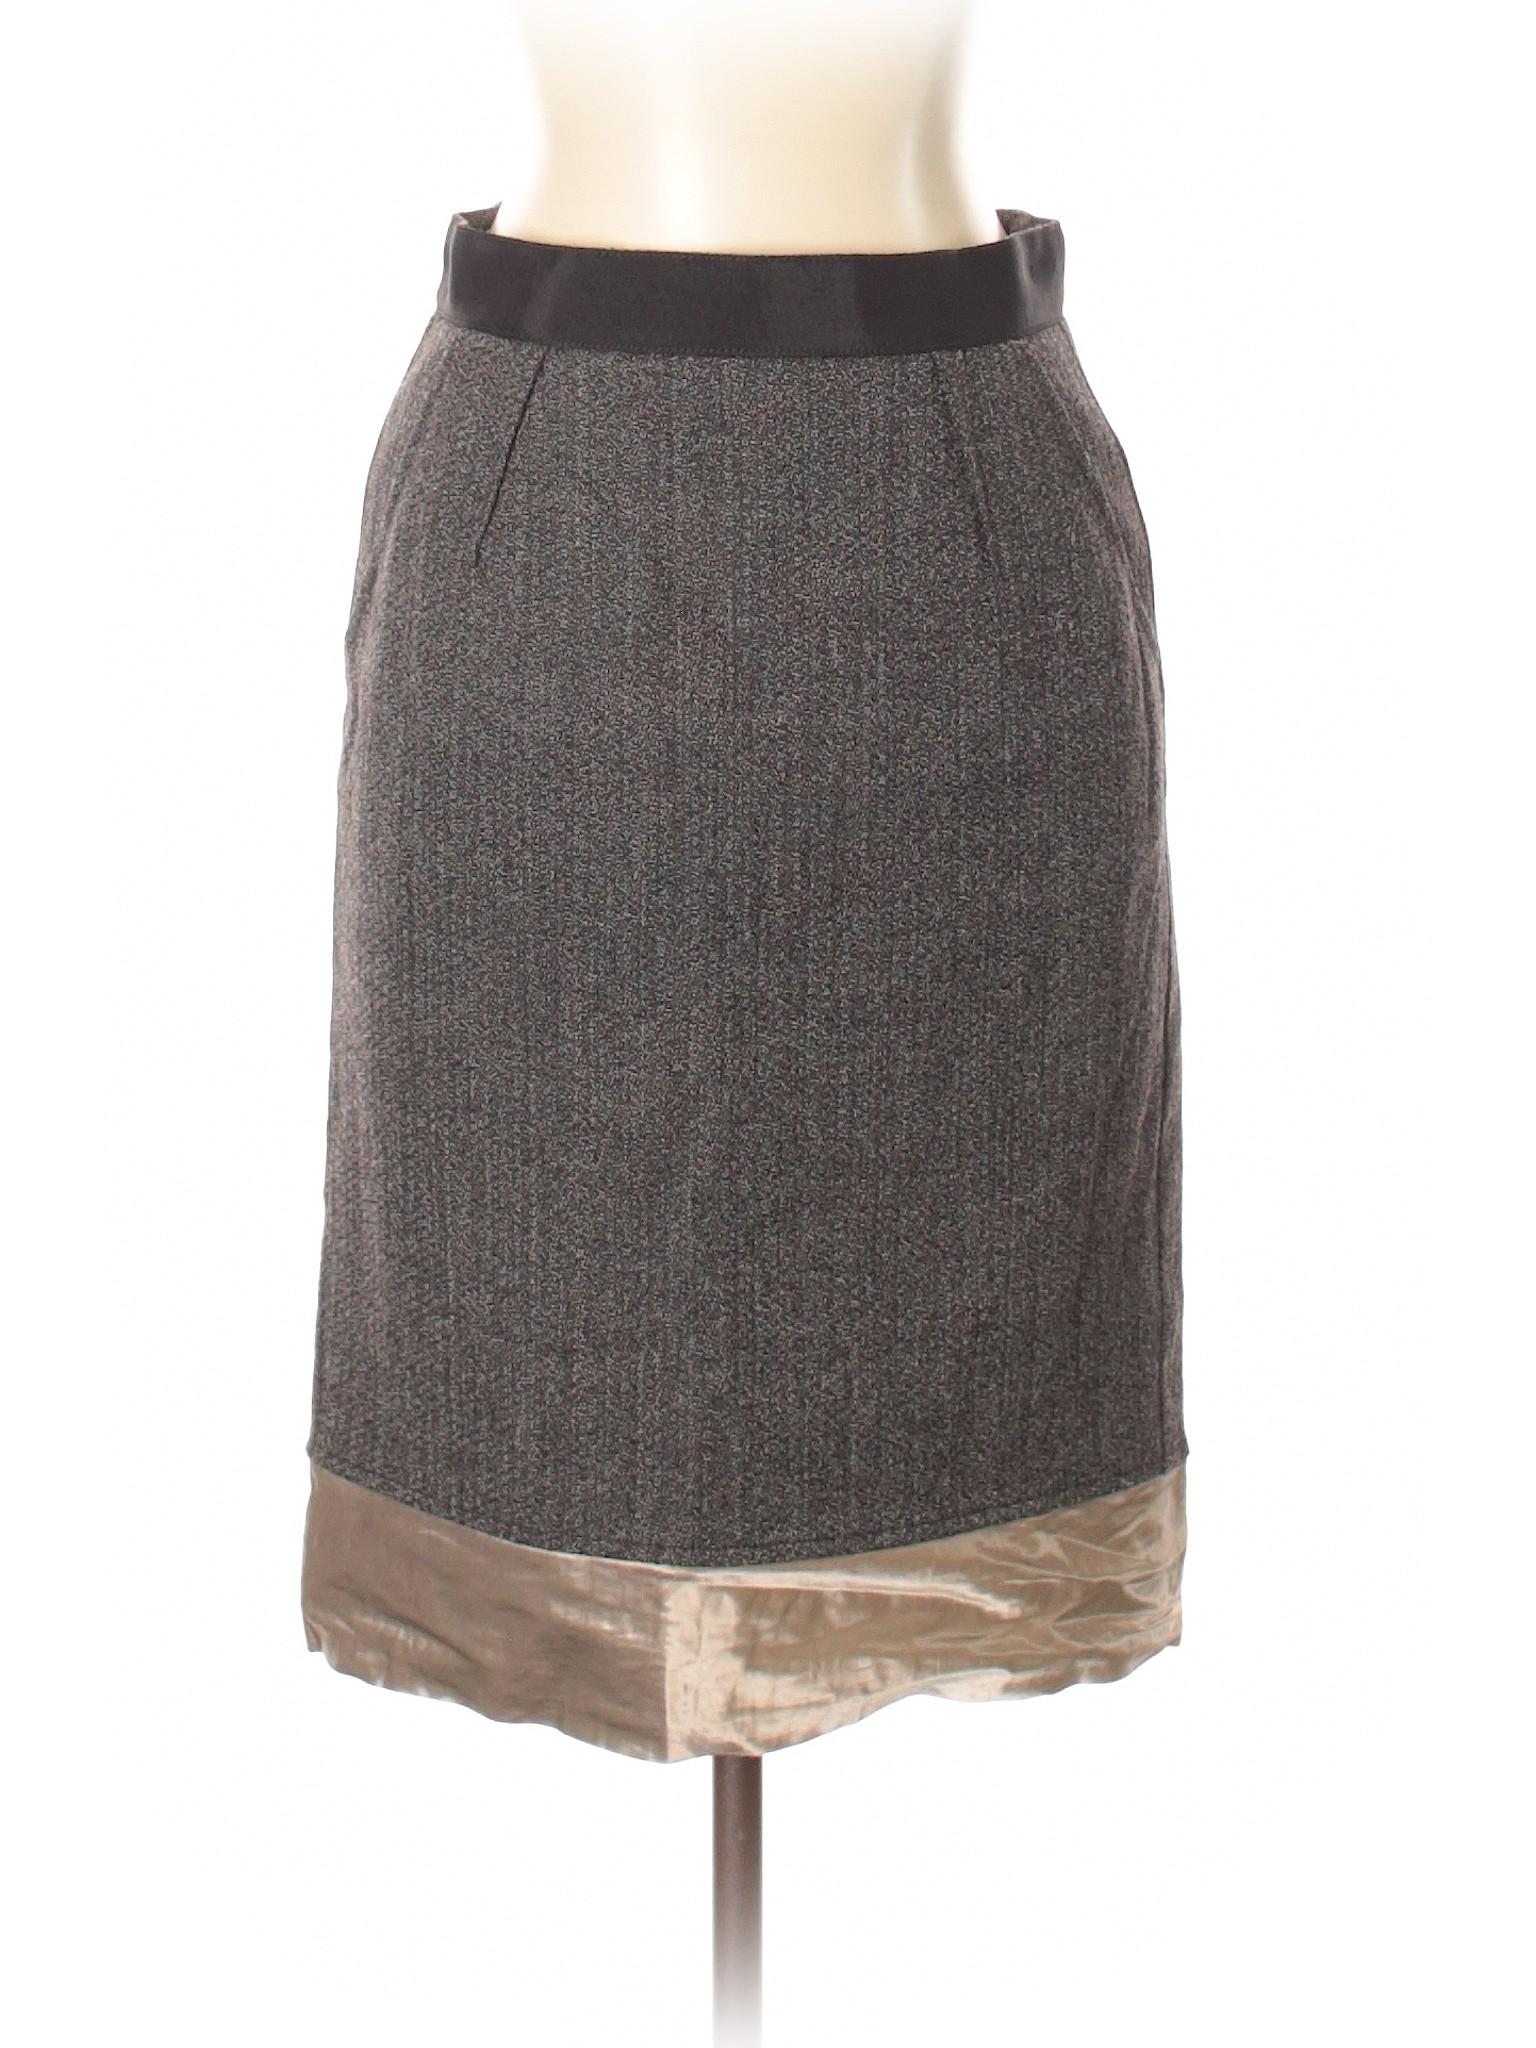 Boutique Boutique Skirt Wool Skirt Wool Boutique YFtFR